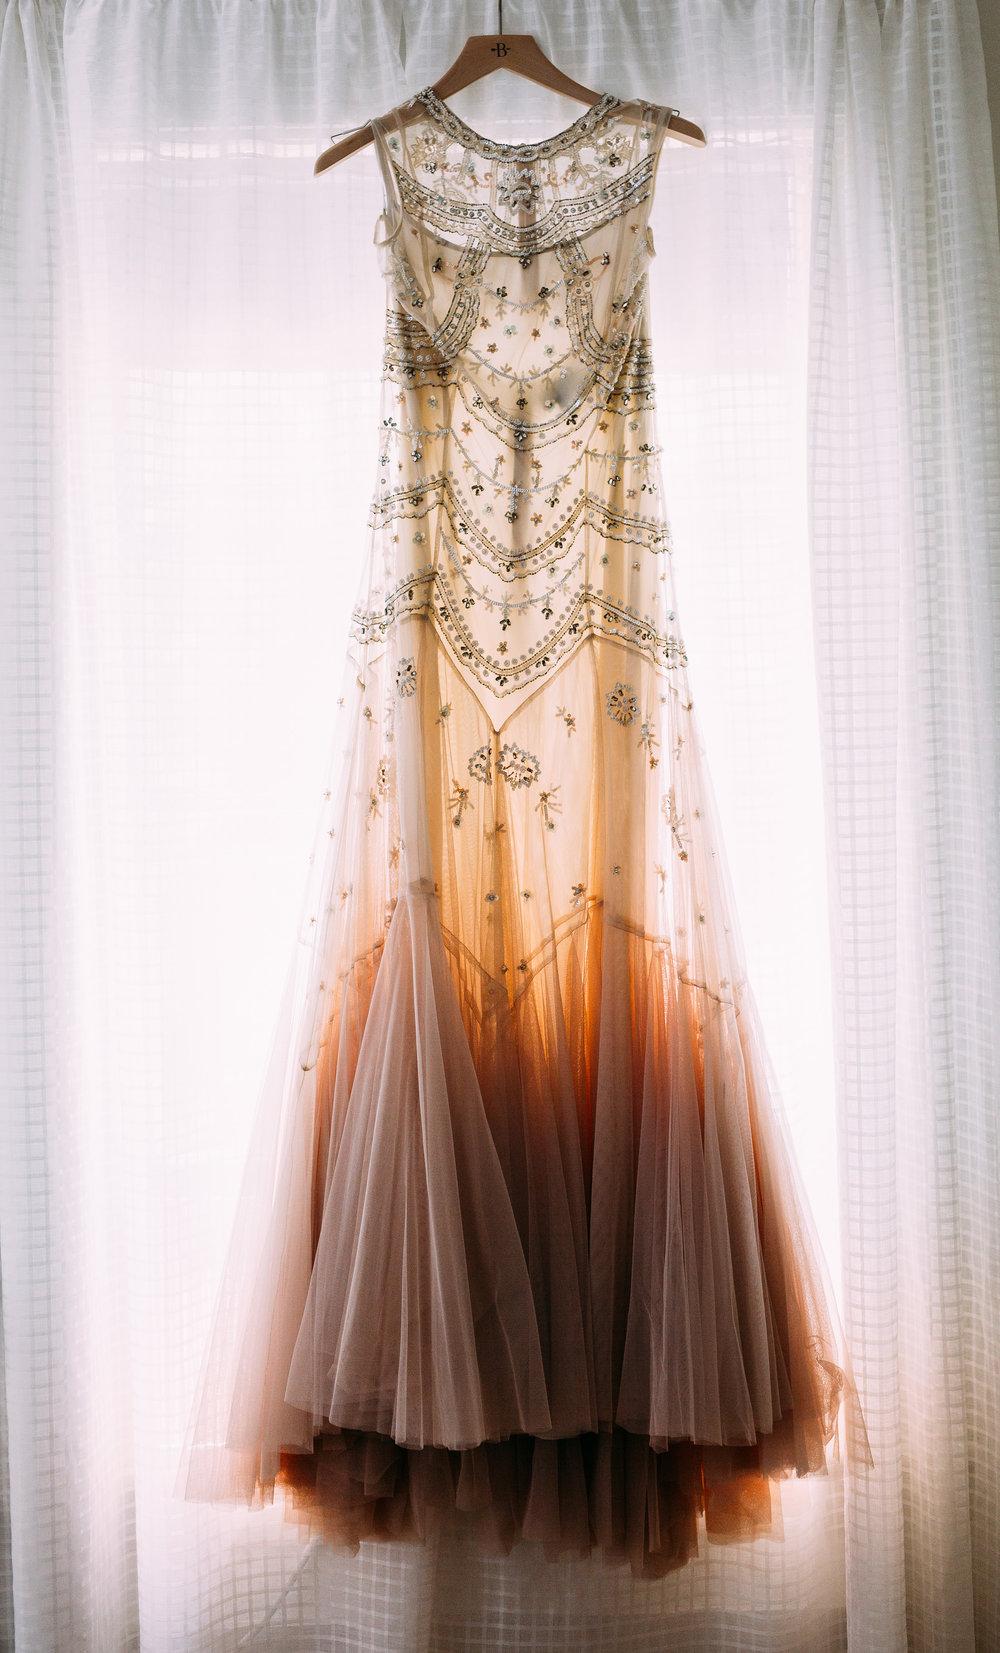 RickSara_Wedding_Morning_PreCeremony-66.jpg